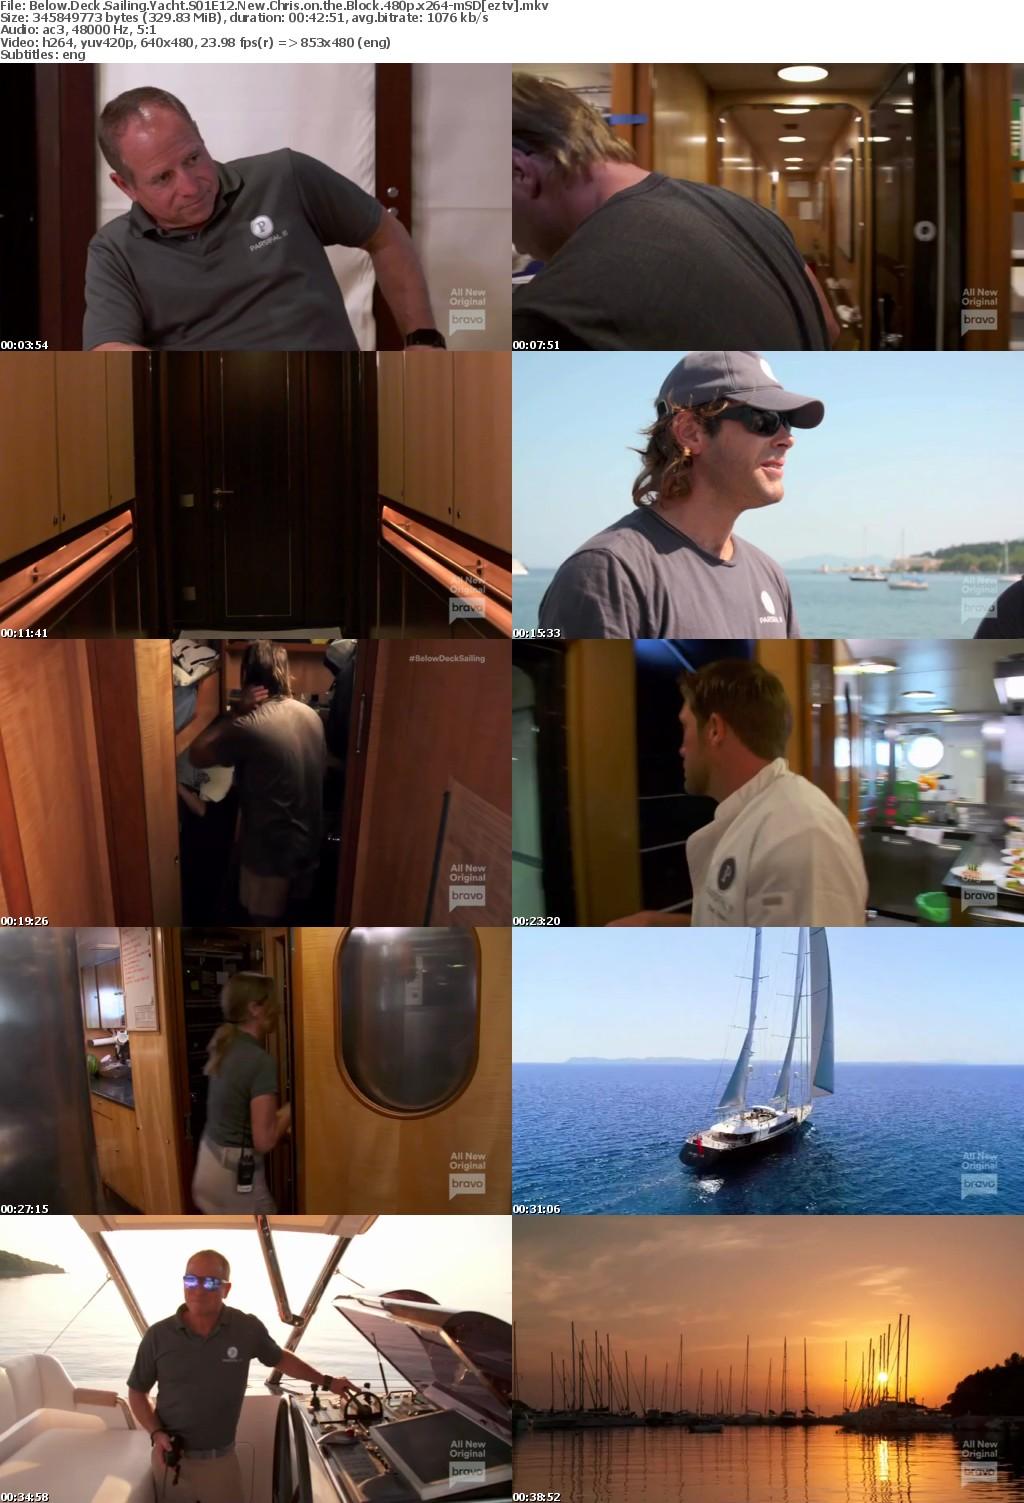 Below Deck Sailing Yacht S01E12 New Chris on the Block 480p x264-mSD